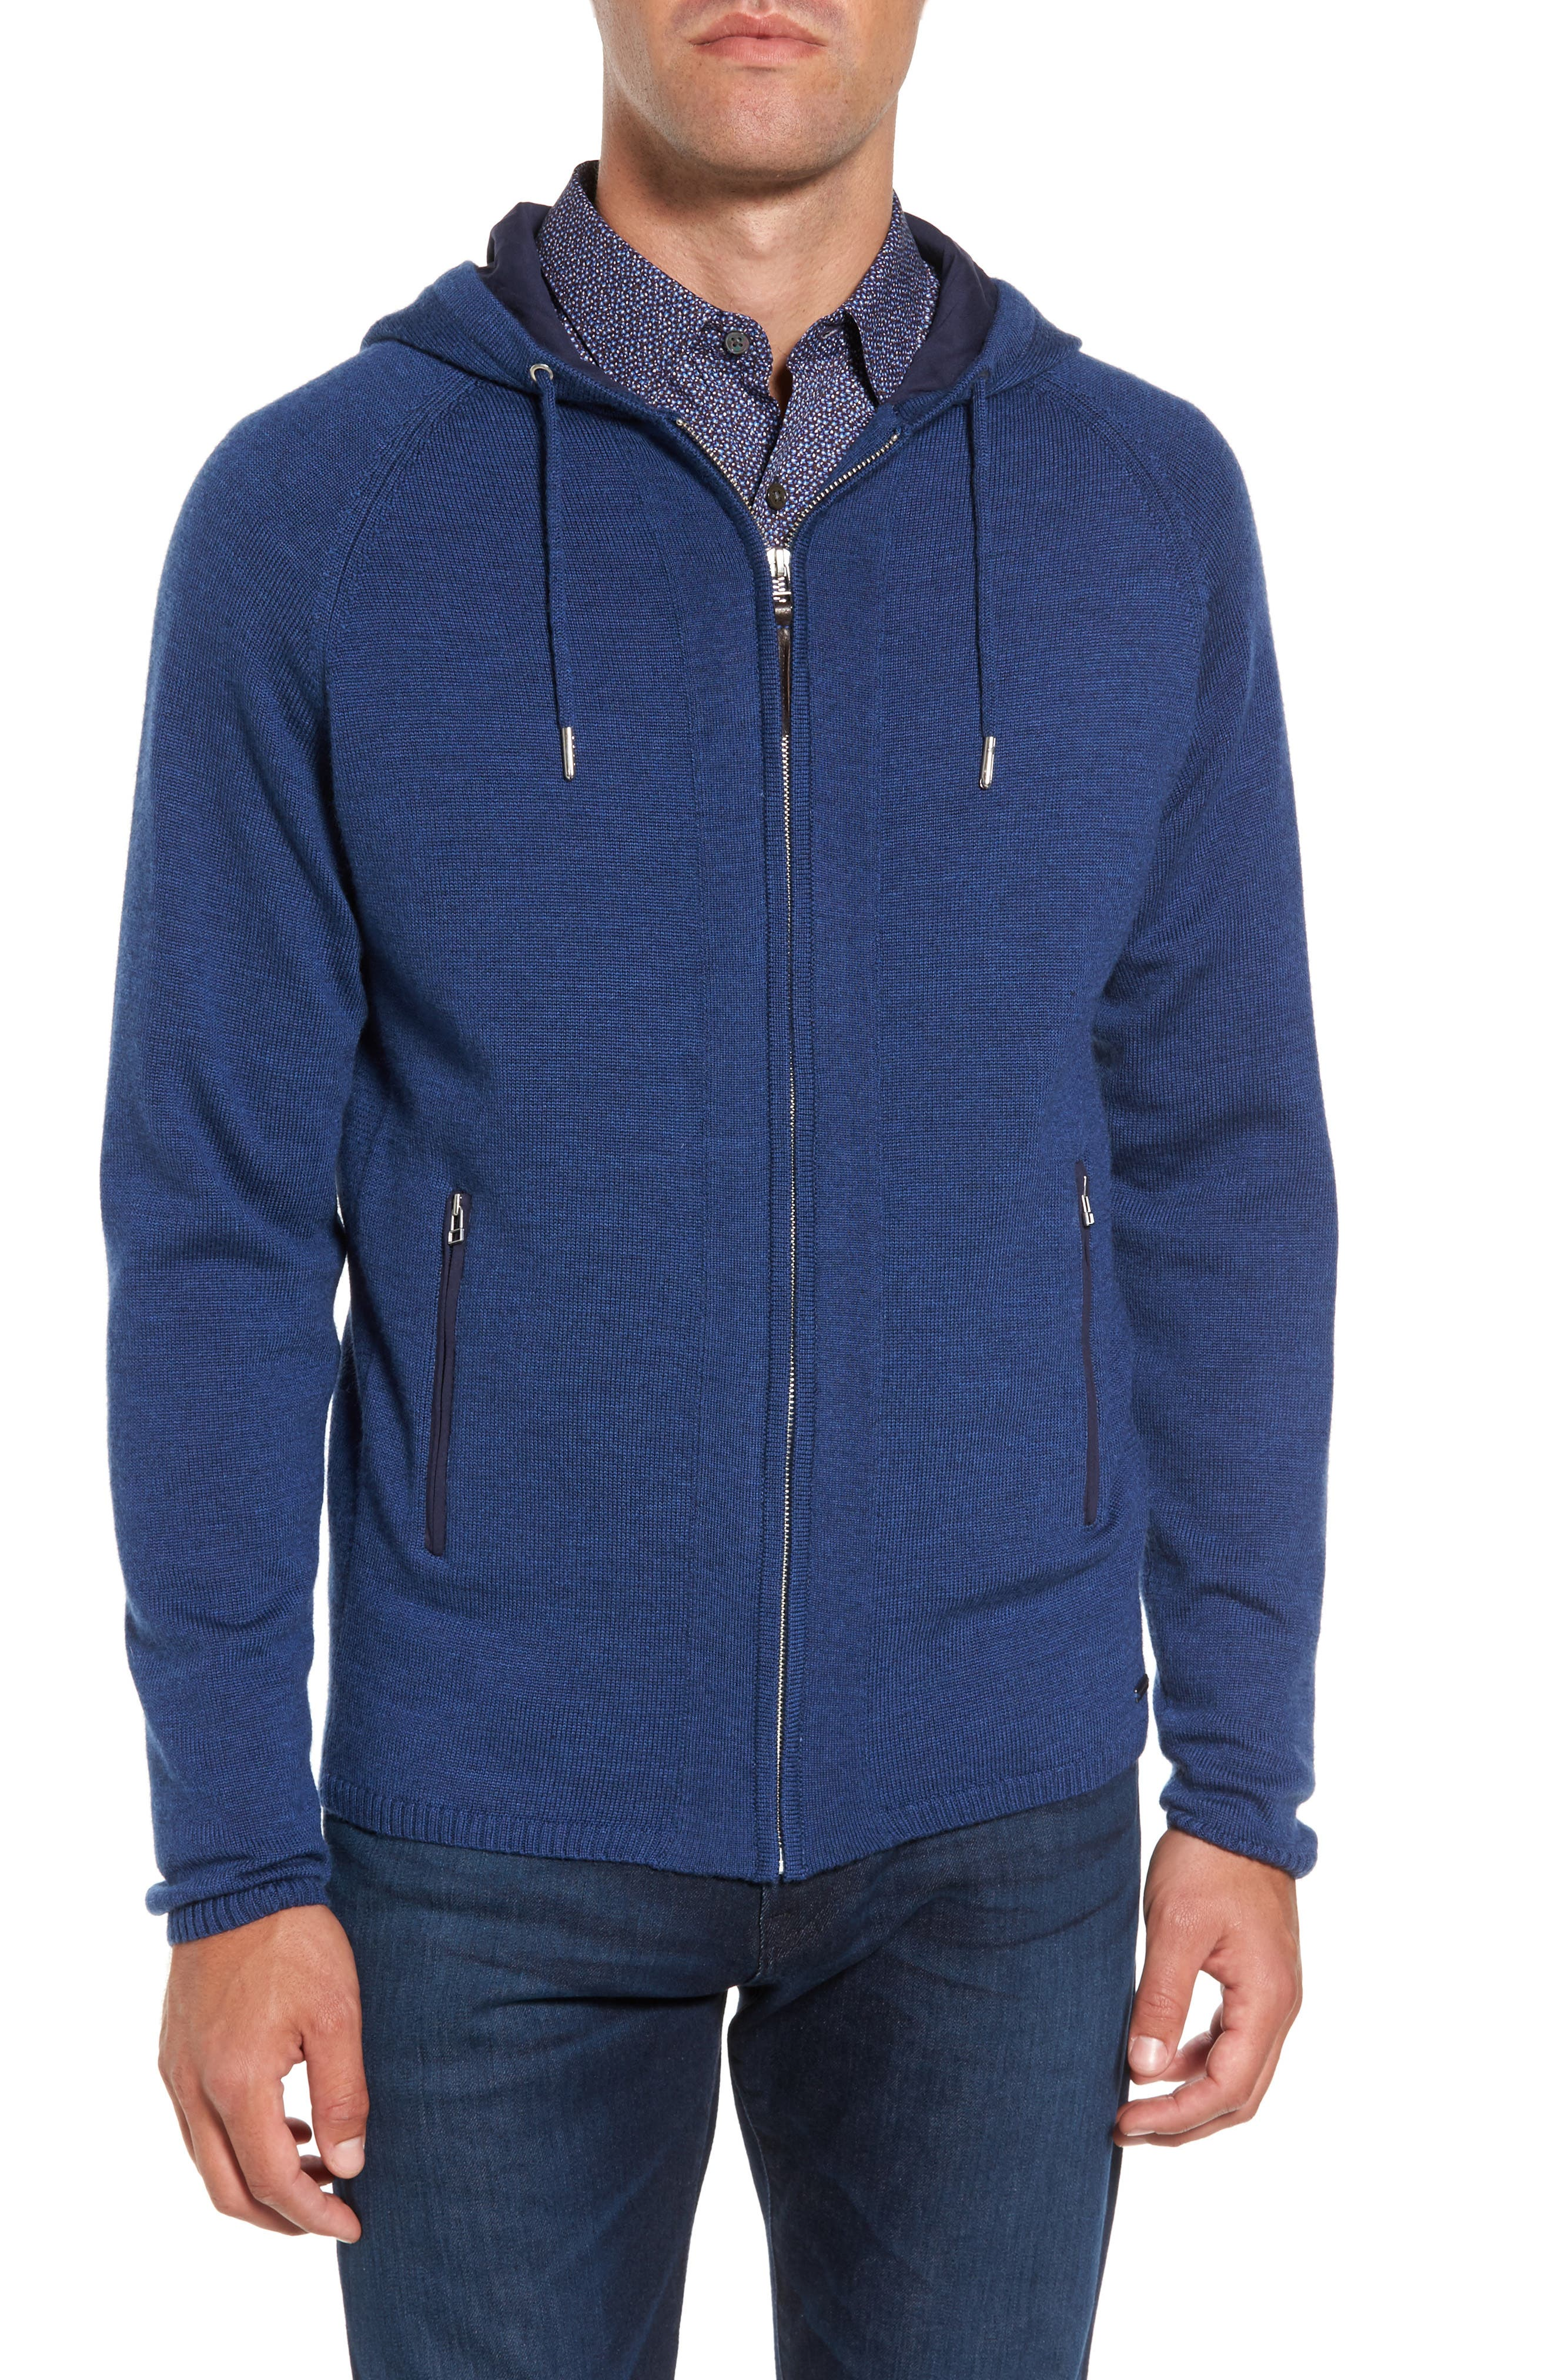 Alternate Image 1 Selected - Rodd & Gunn Grand Vue Hooded Zip Front Knit Sweater